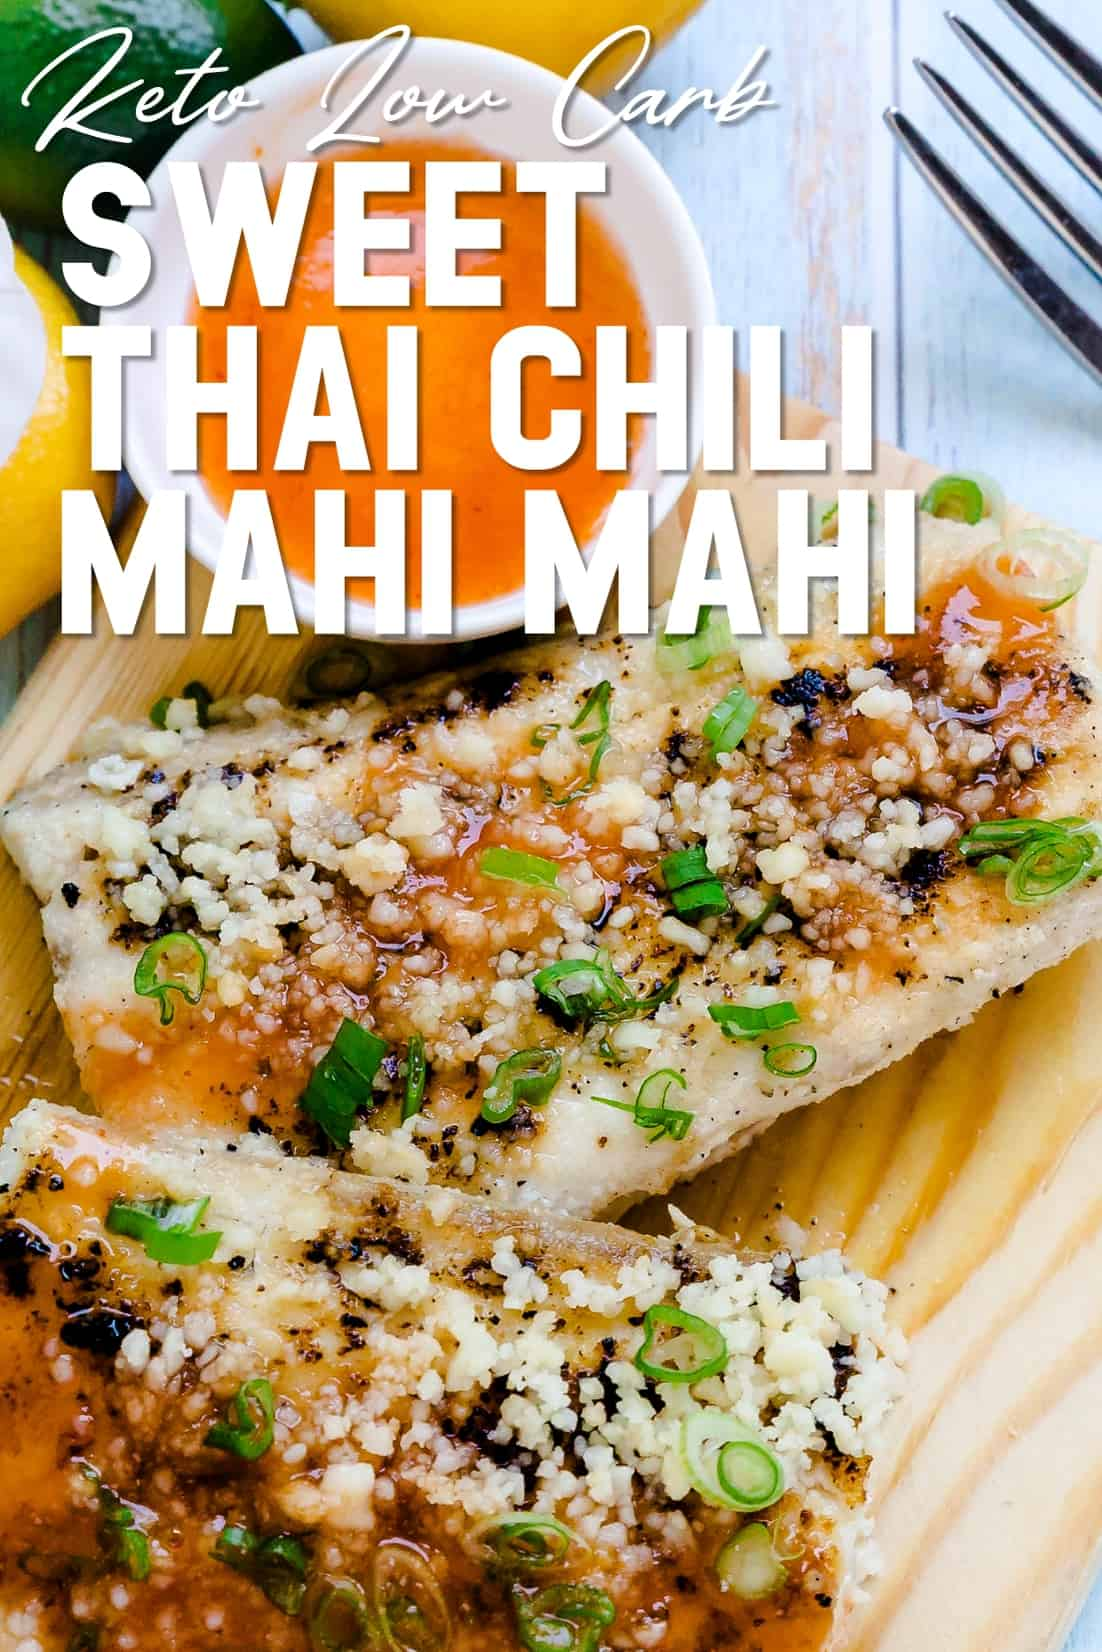 Keto Low Carb Sweet Thai Chili Mahi Mahi LowCarbingAsian Pin 2